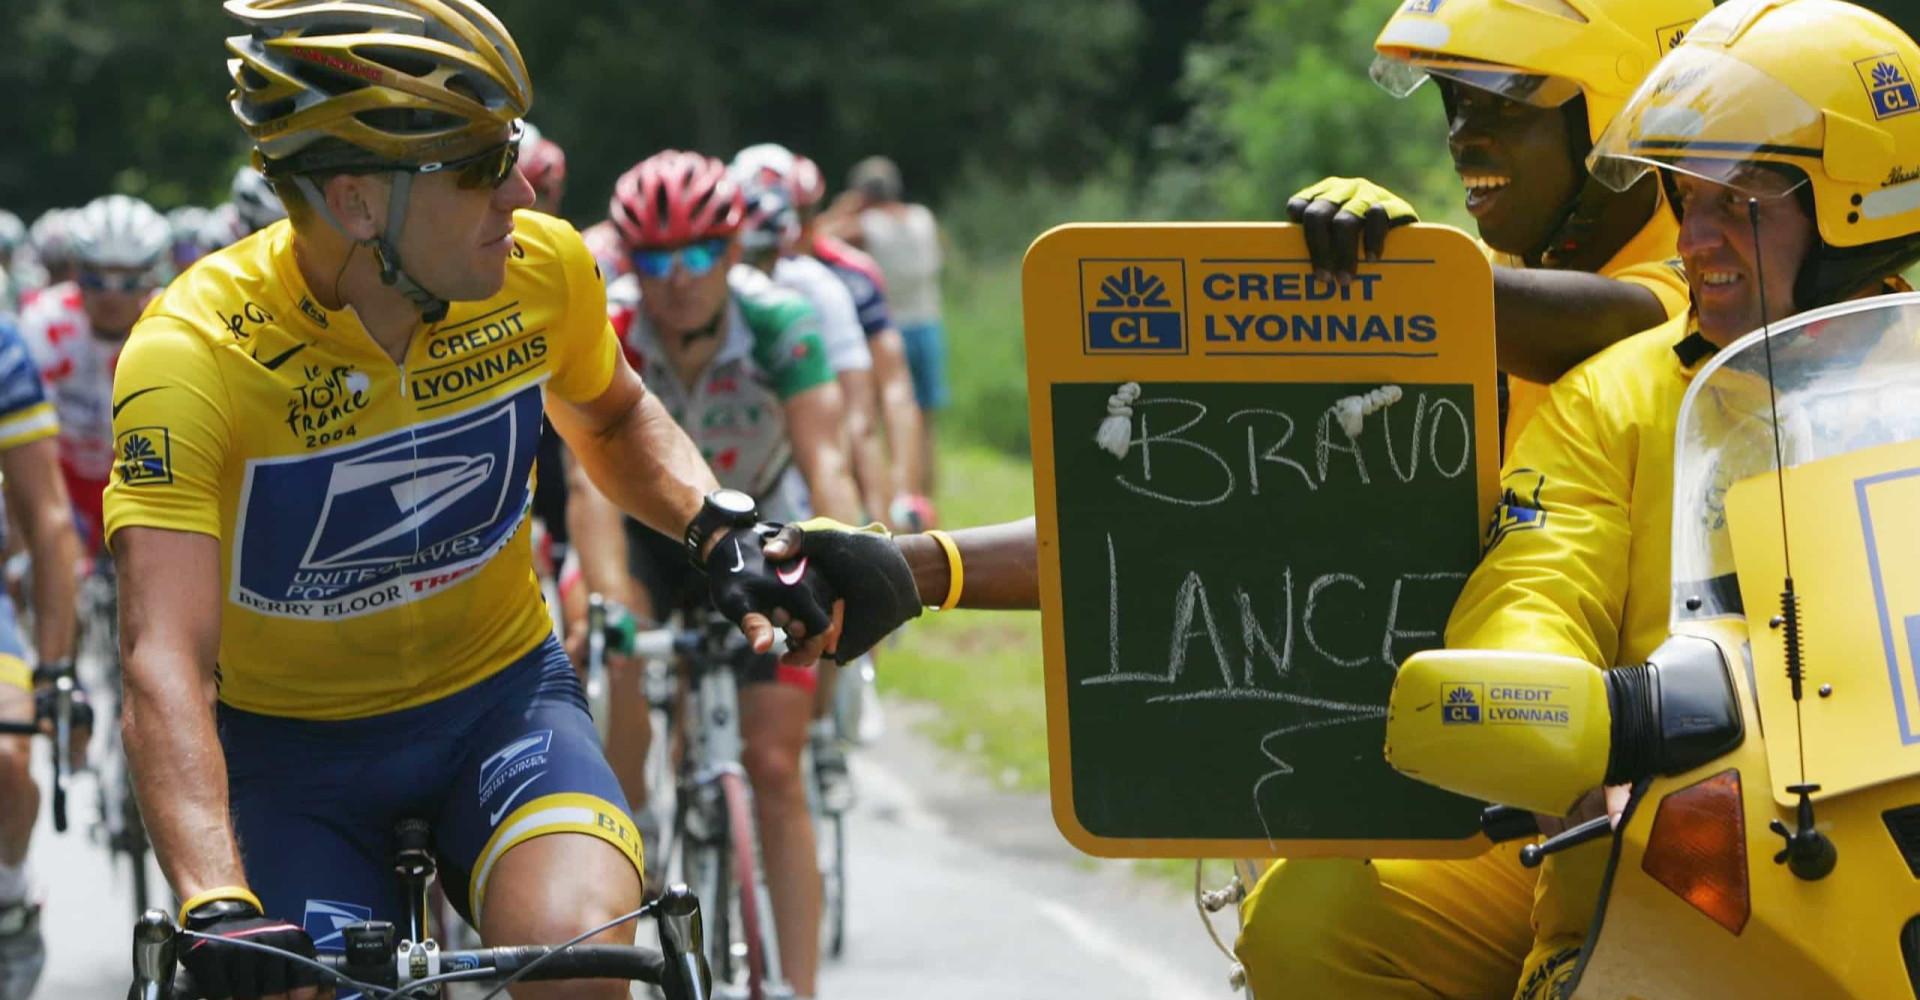 Tour de Francen historian suurimmat dopingskandaalit